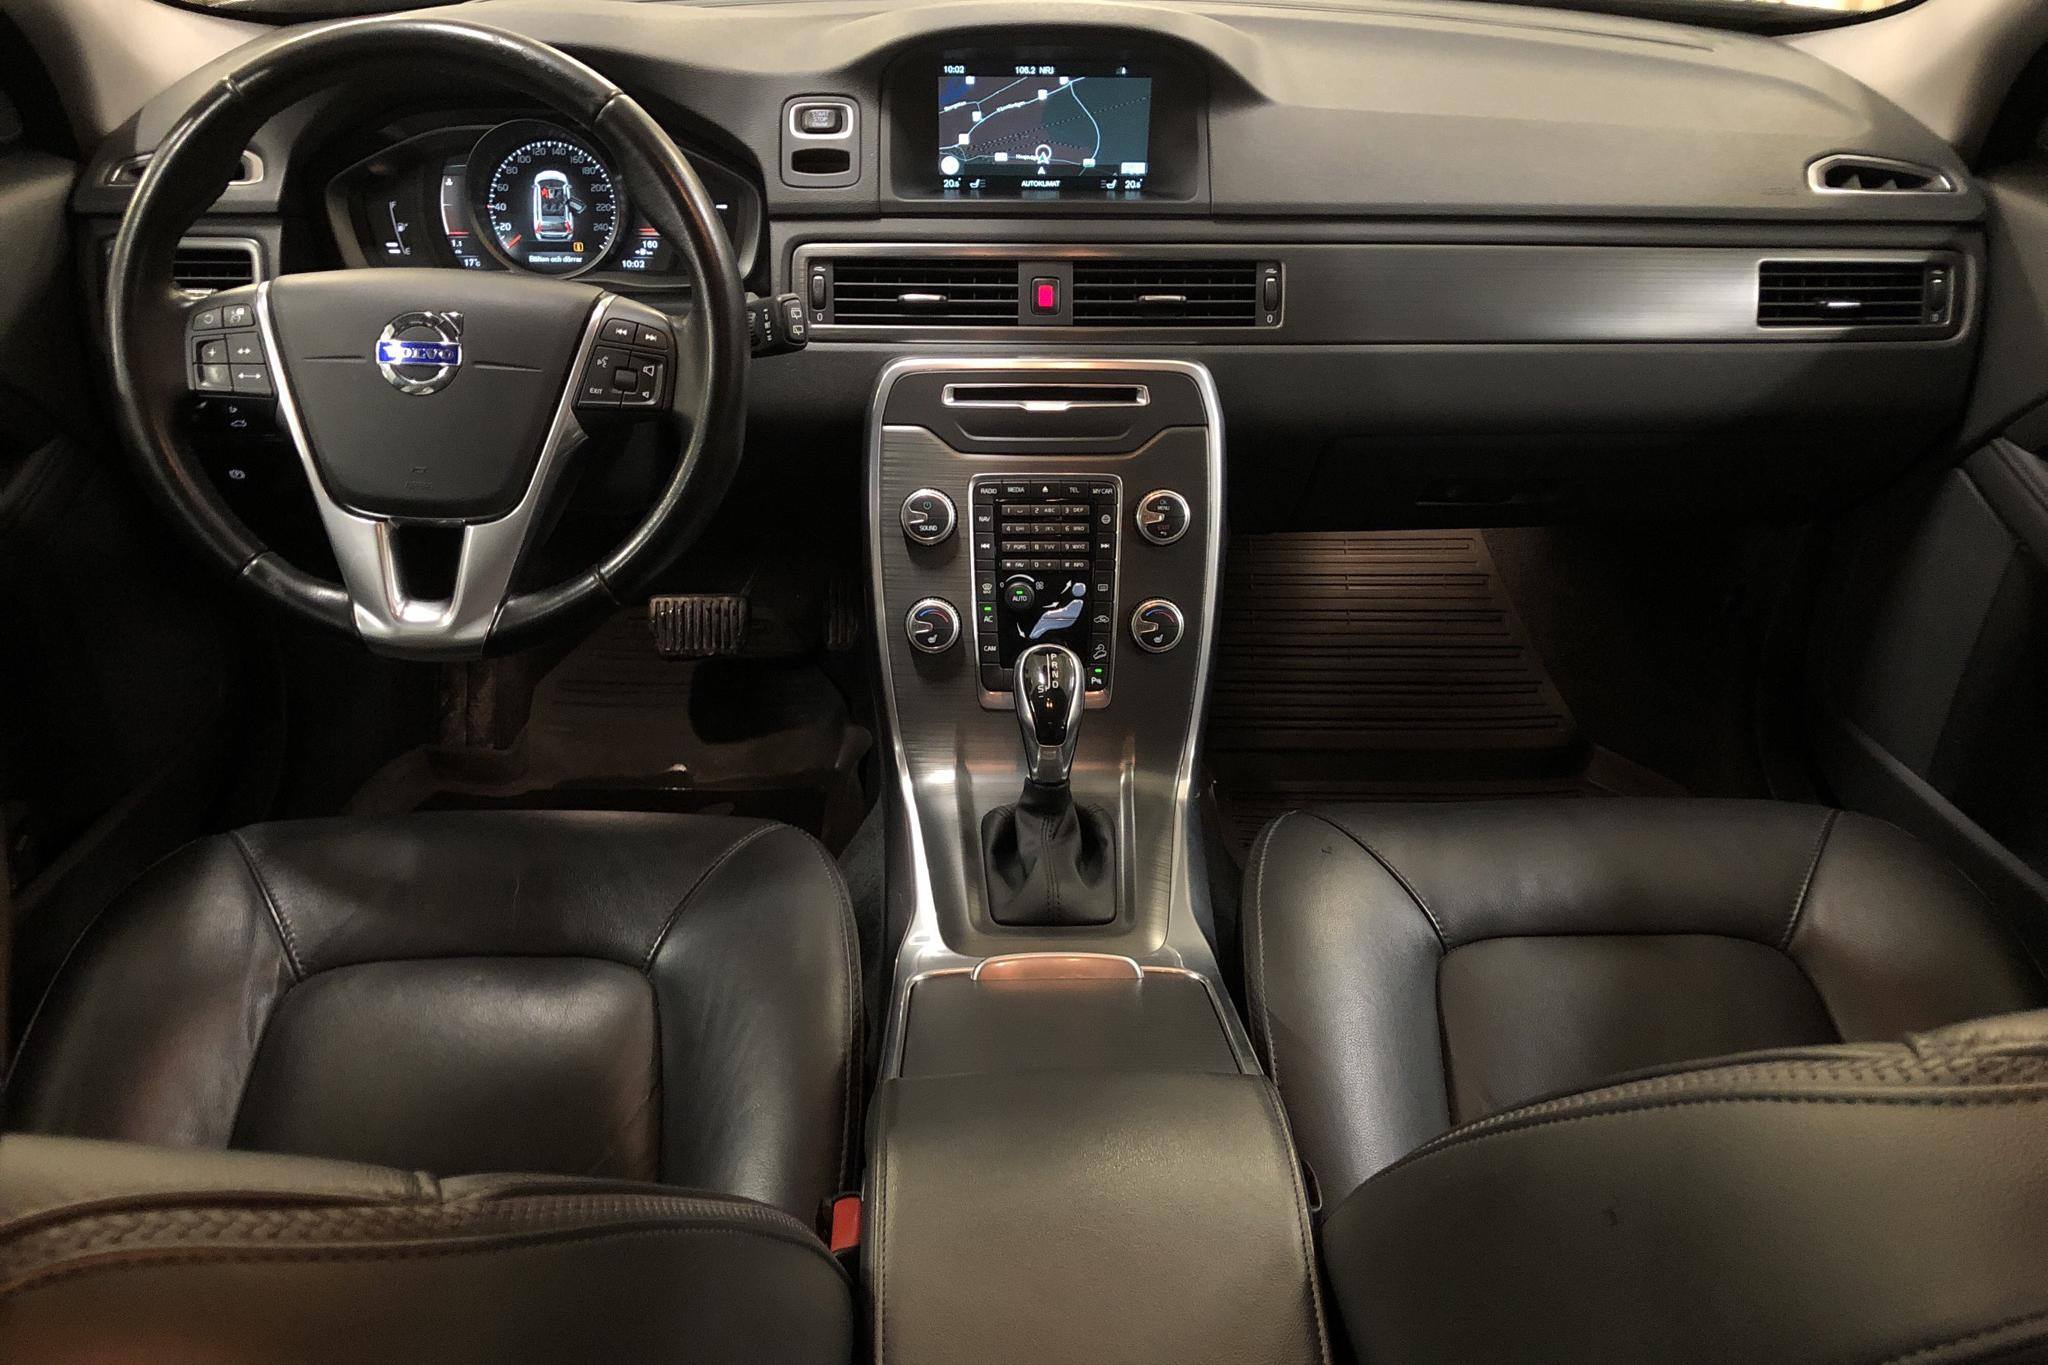 Volvo XC70 II D4 AWD (181hk) - 77 500 km - Automatic - silver - 2016